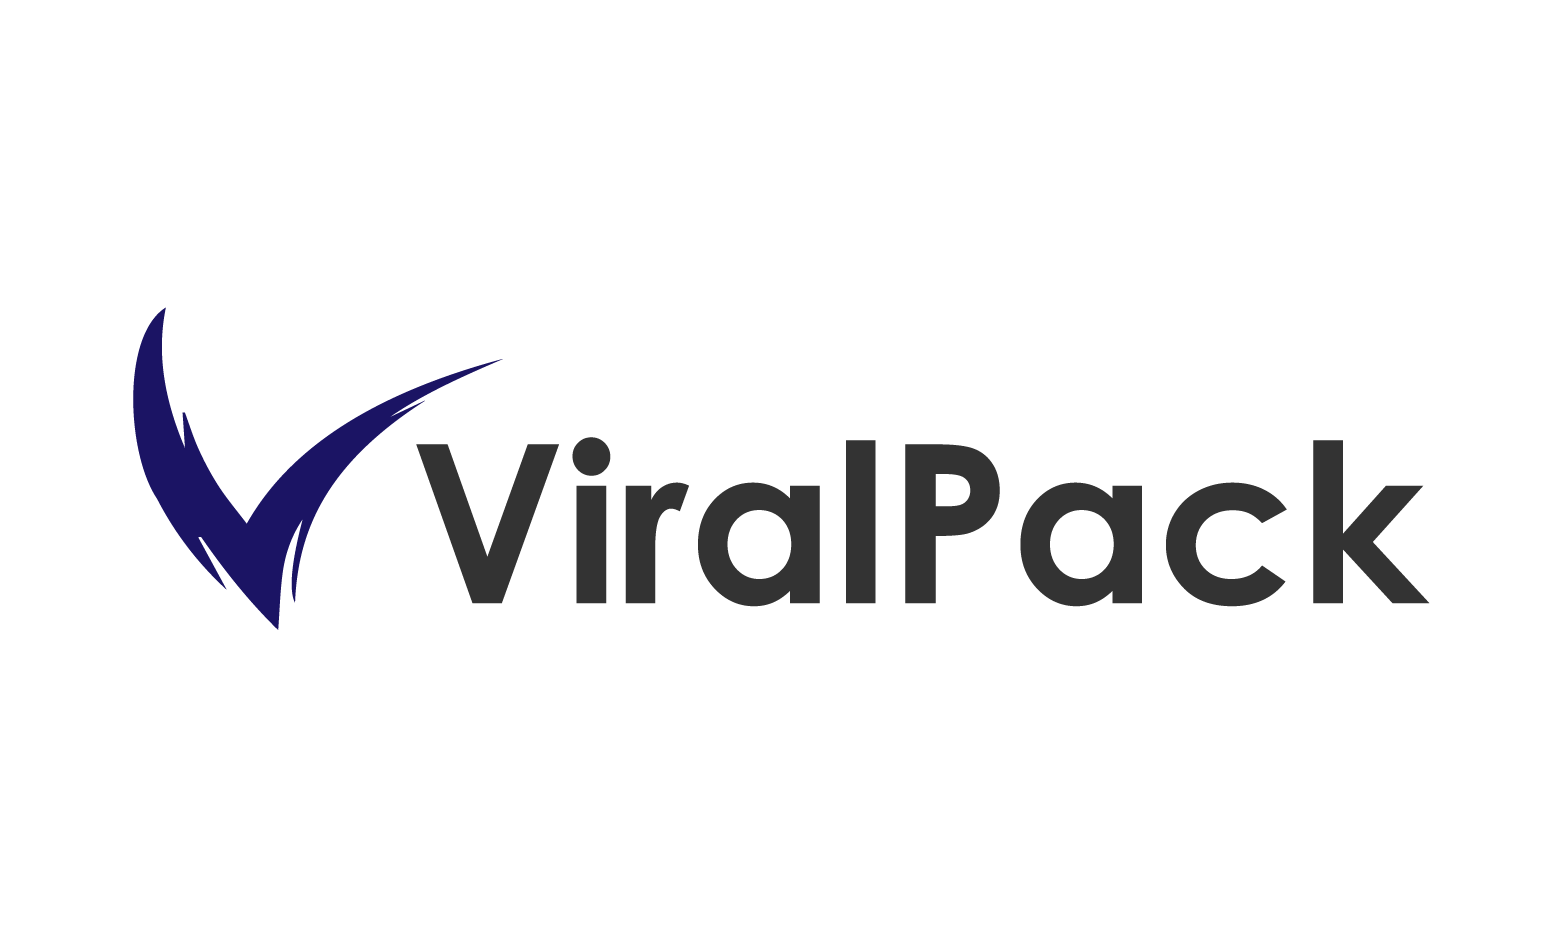 ViralPack.com